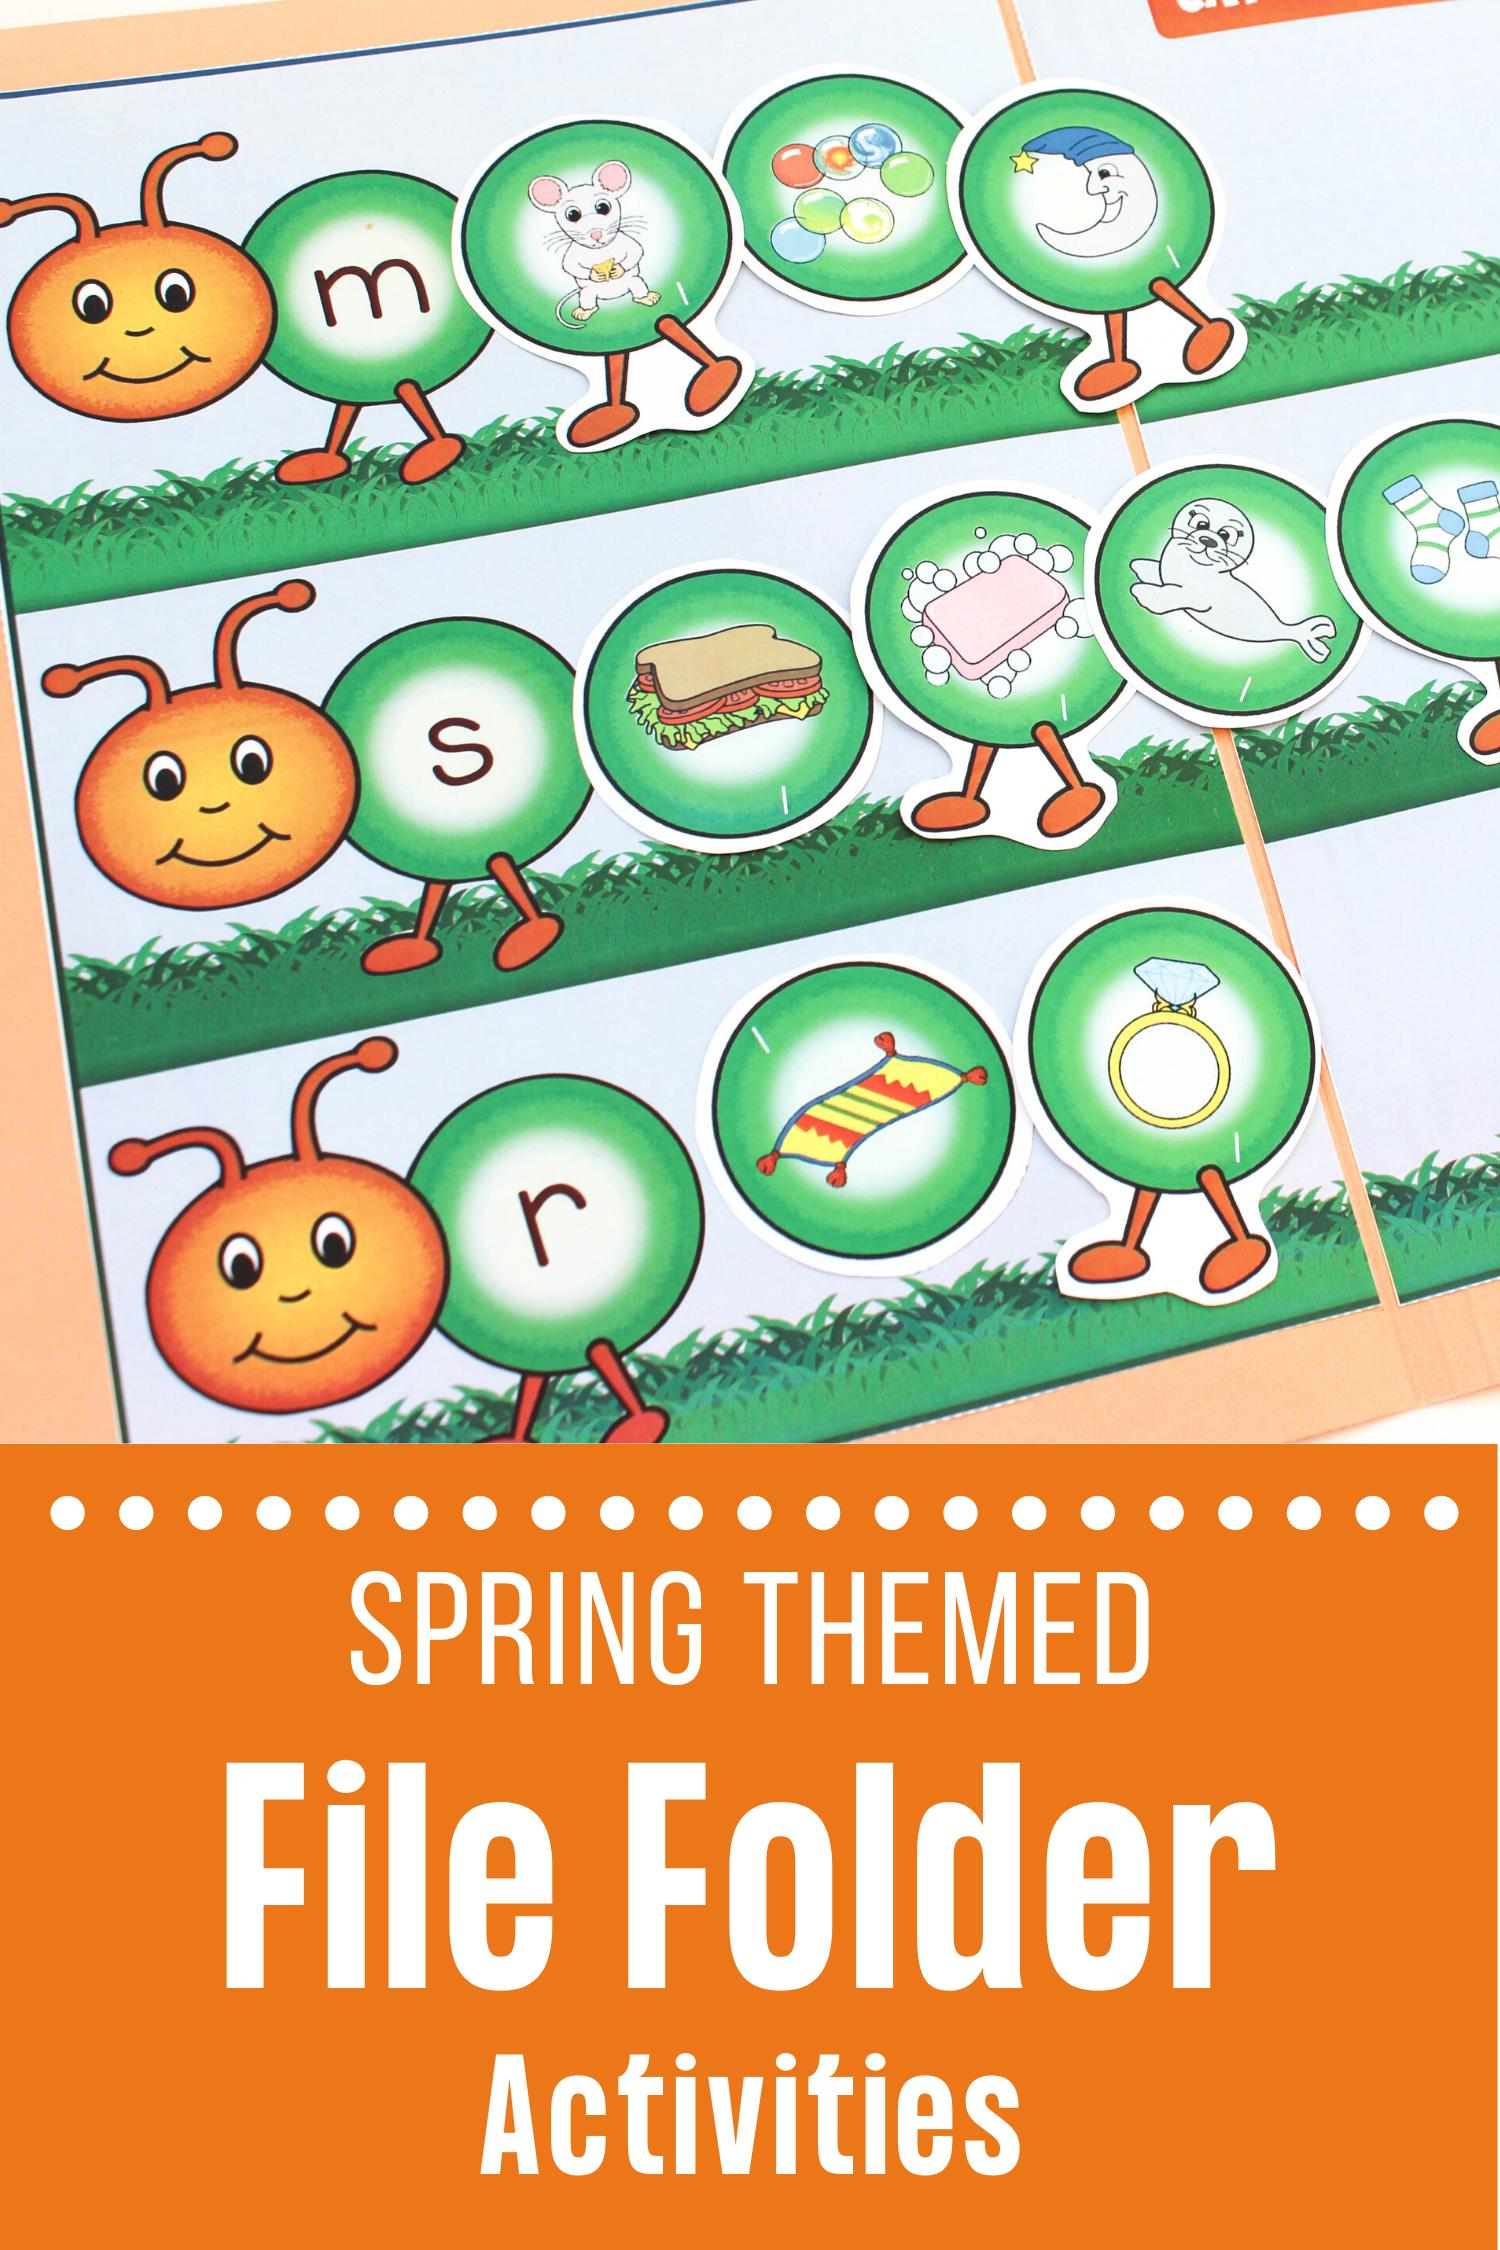 File Folder Games In